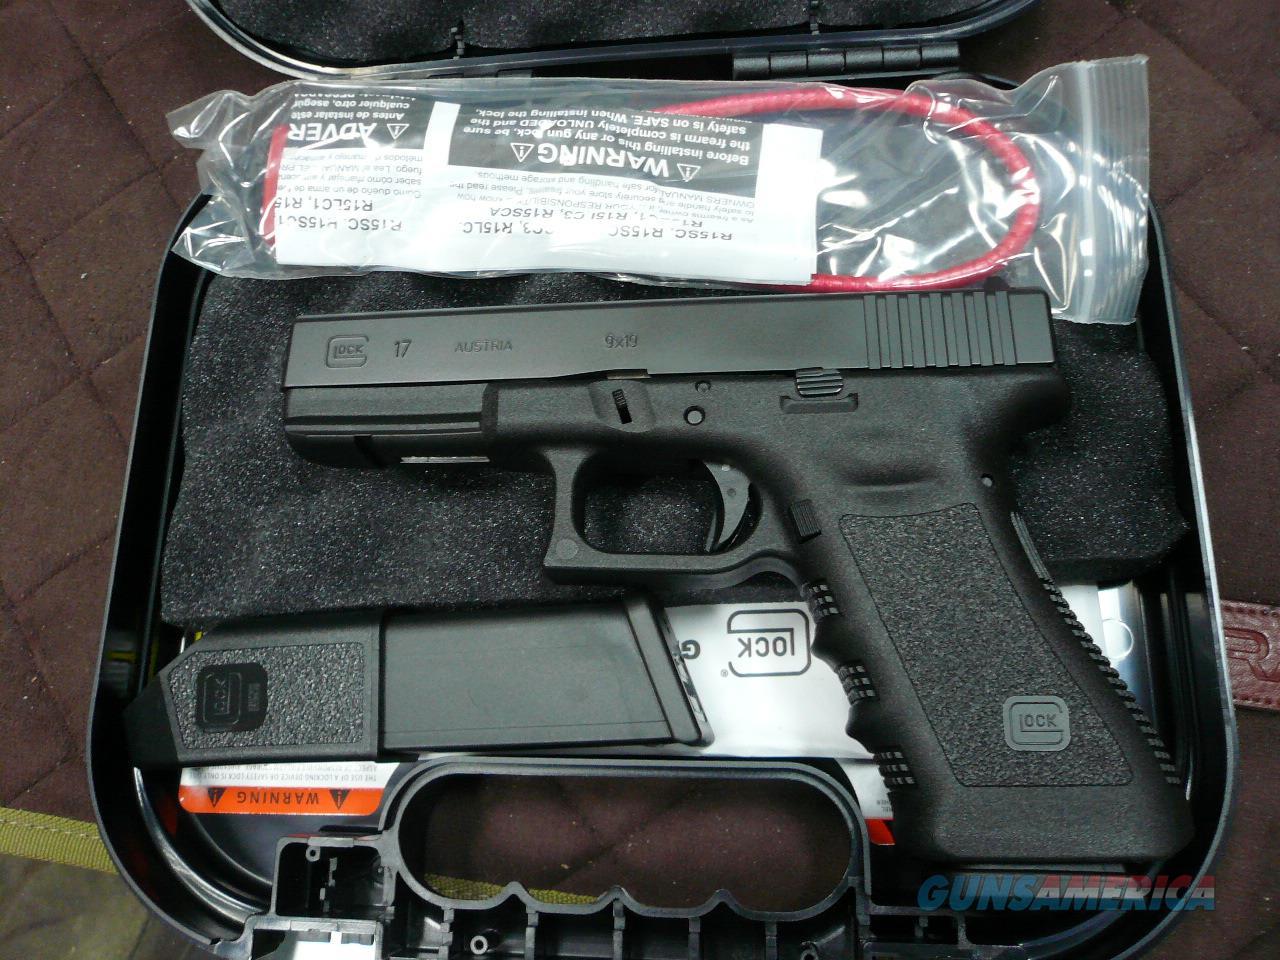 17 9mm NIB  Guns > Pistols > Glock Pistols > 17